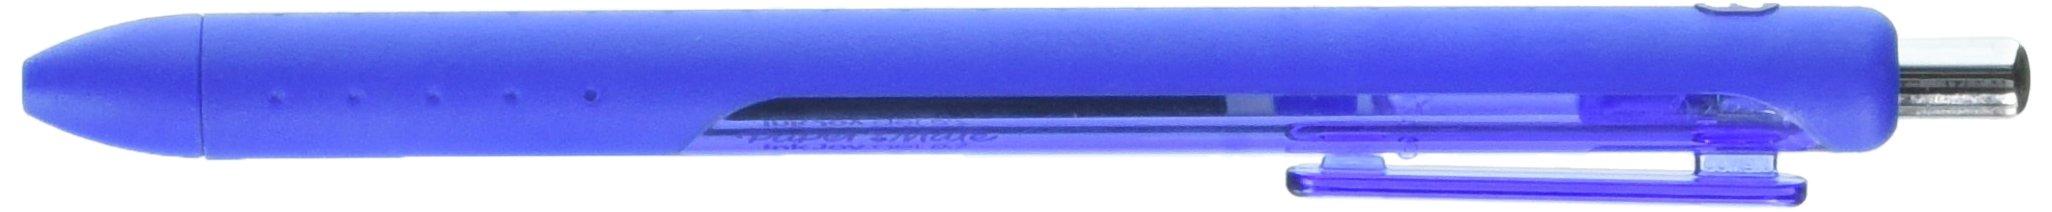 Paper Mate InkJoy Gel Pen, Medium Point, Dark Blue, 12 Count